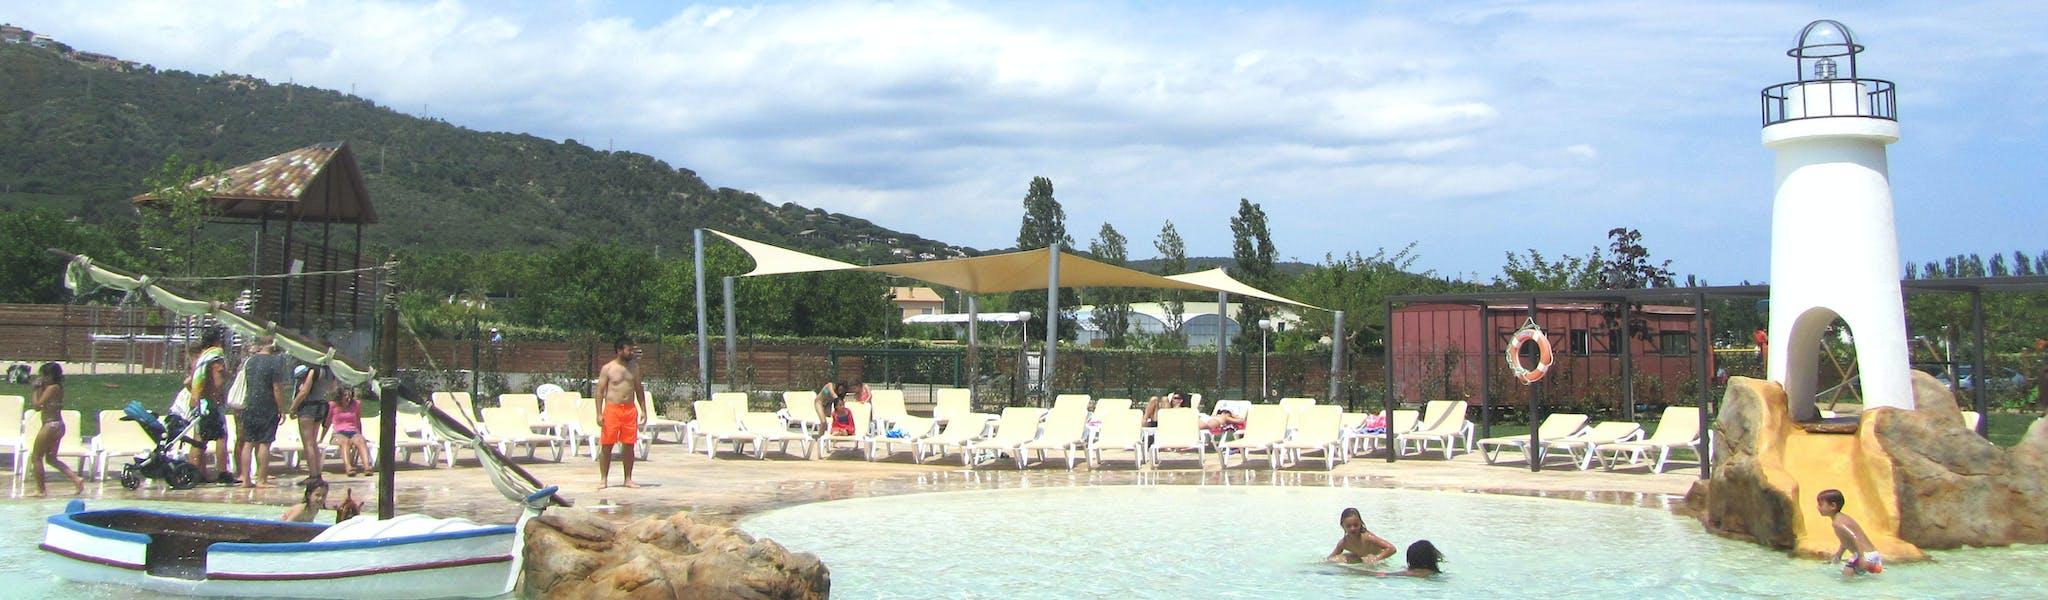 Tropisch zwemparadijs camping Valldaro